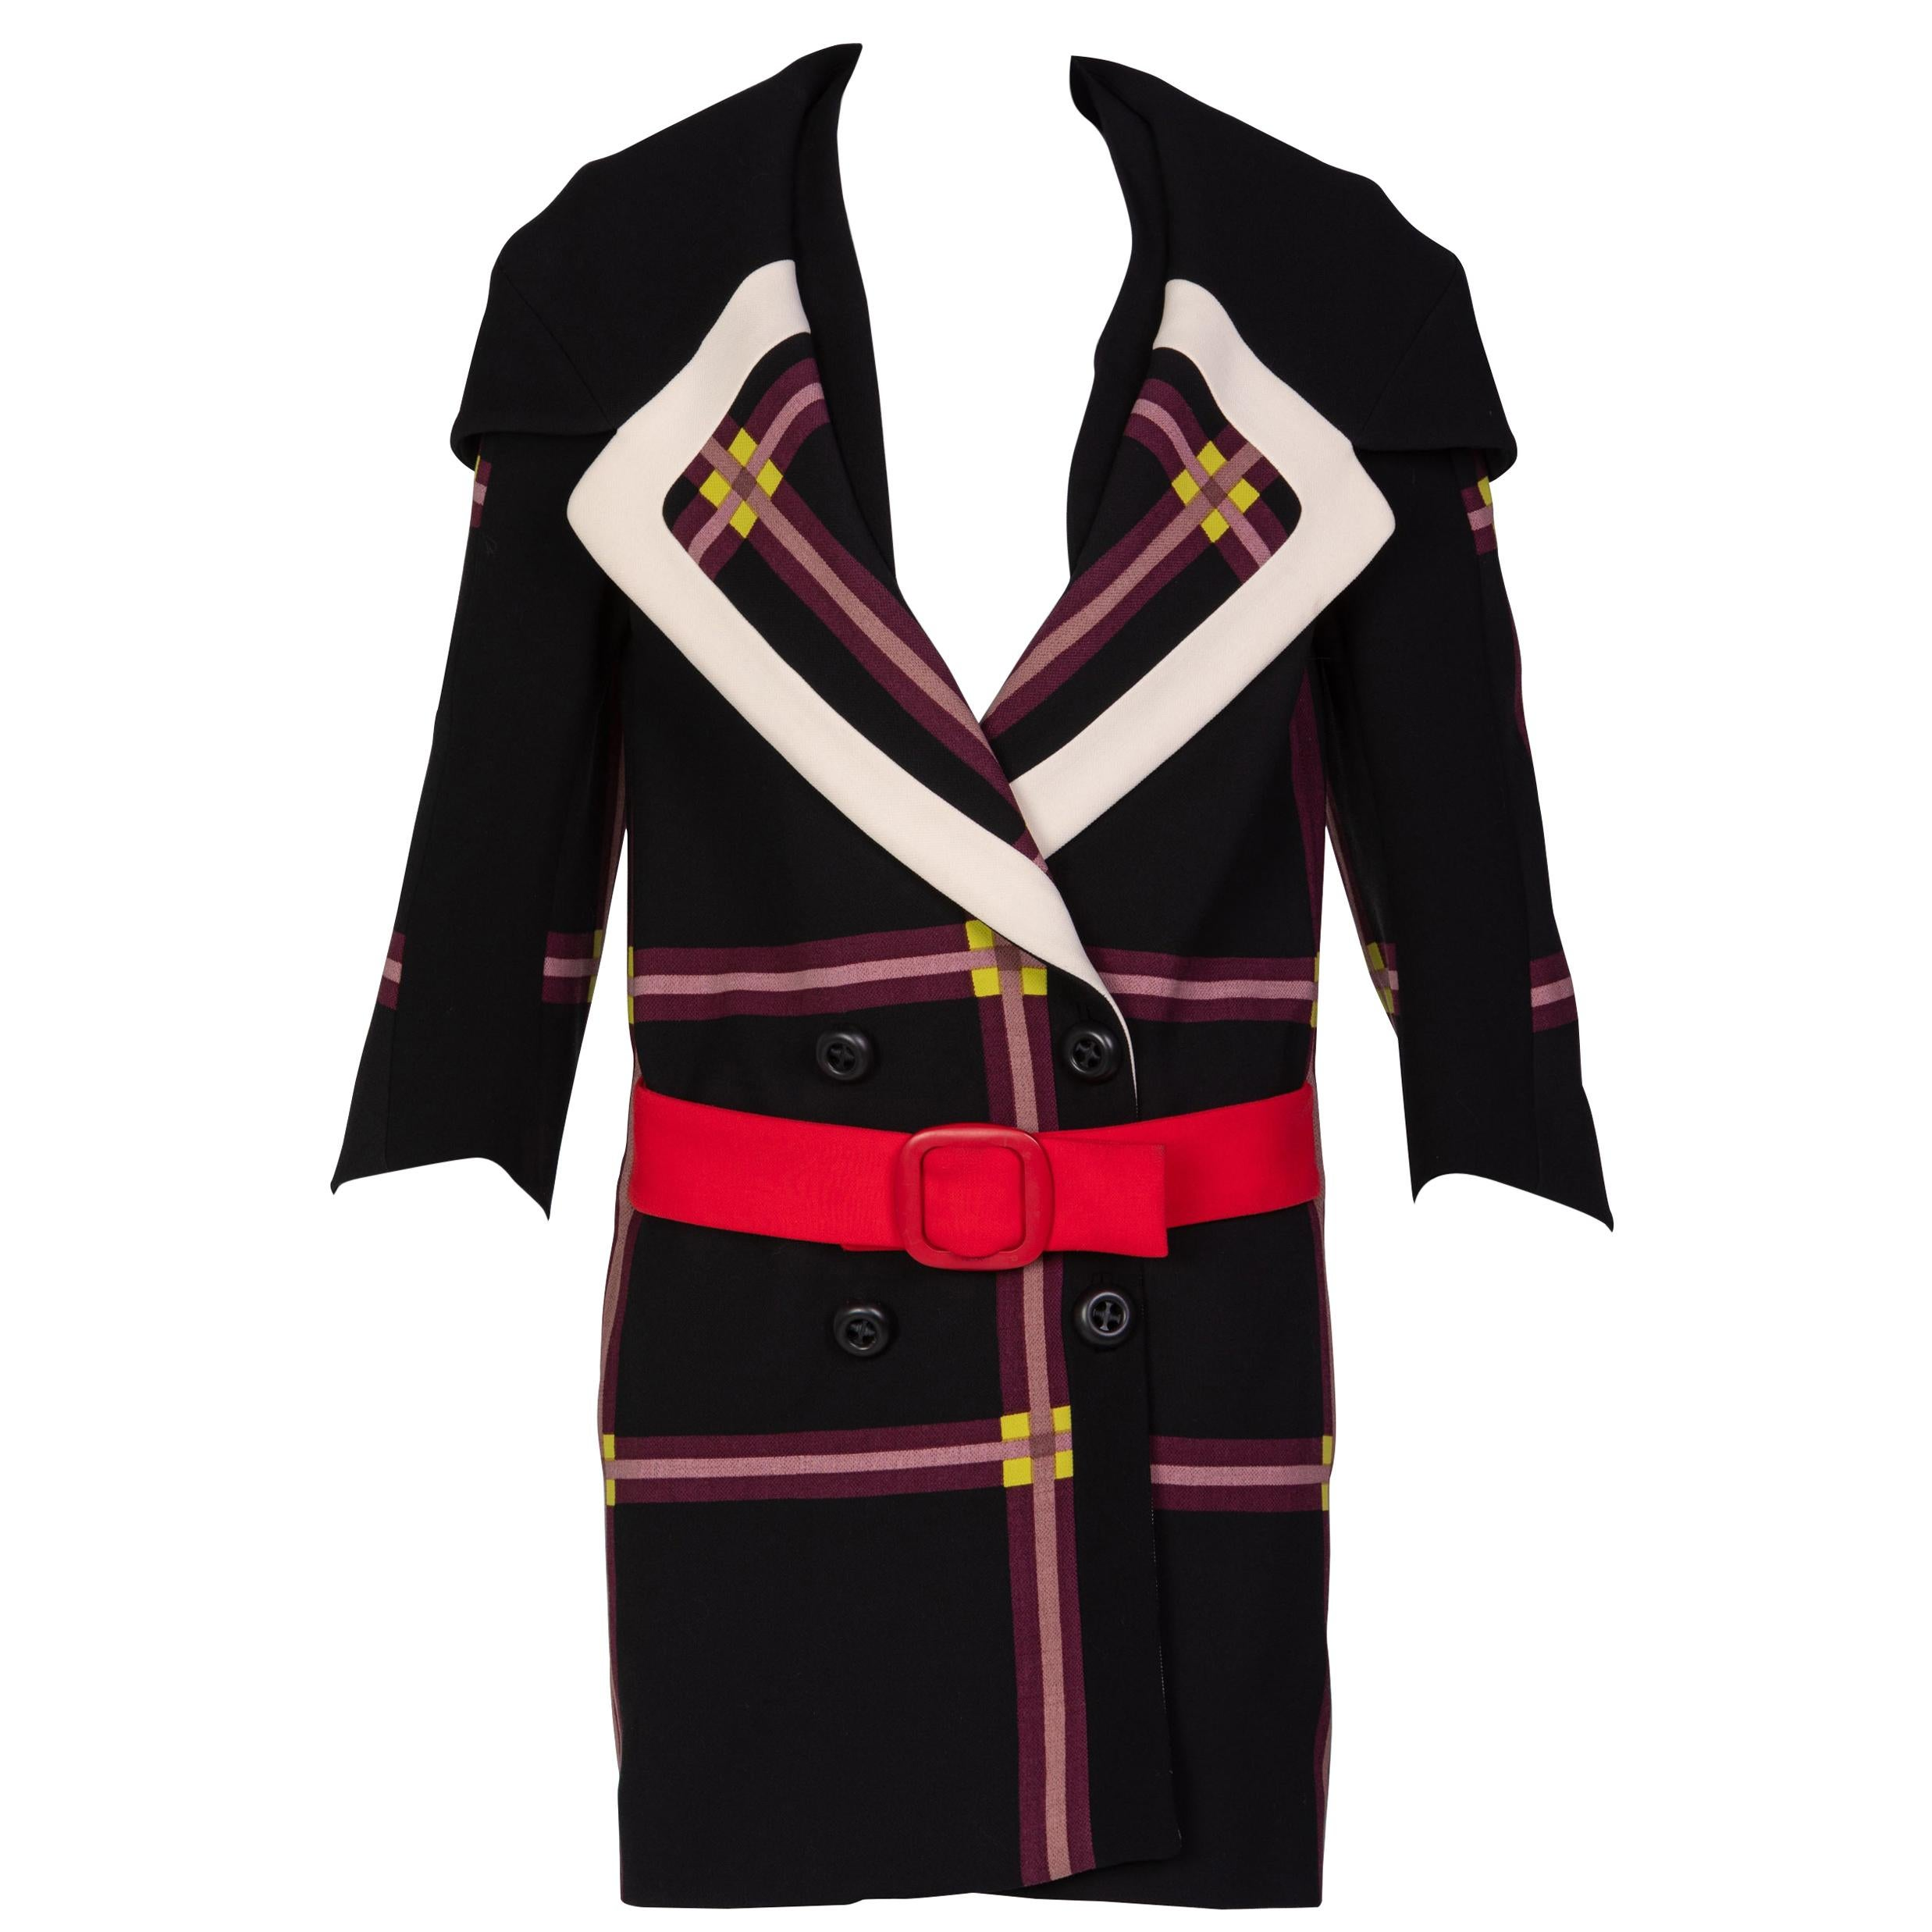 Prada Black Window Pane Wool Coat w/ Red Belt Runway, 2011